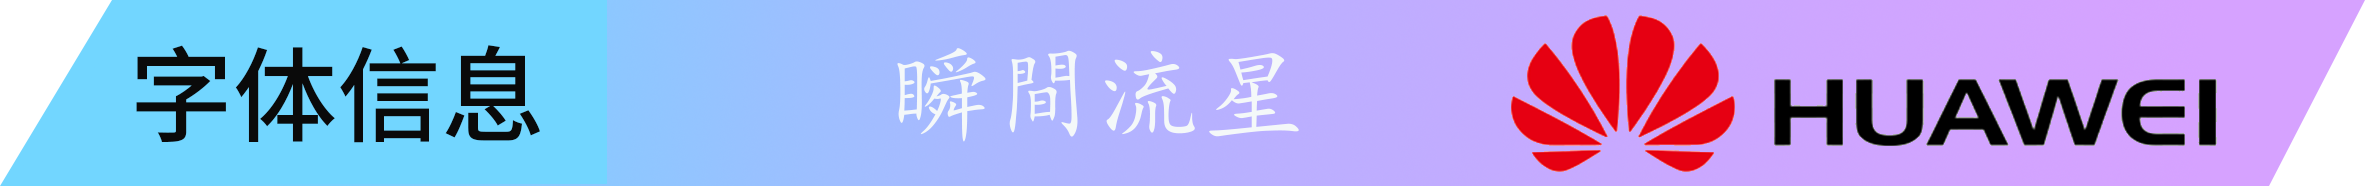 字体信息1.png